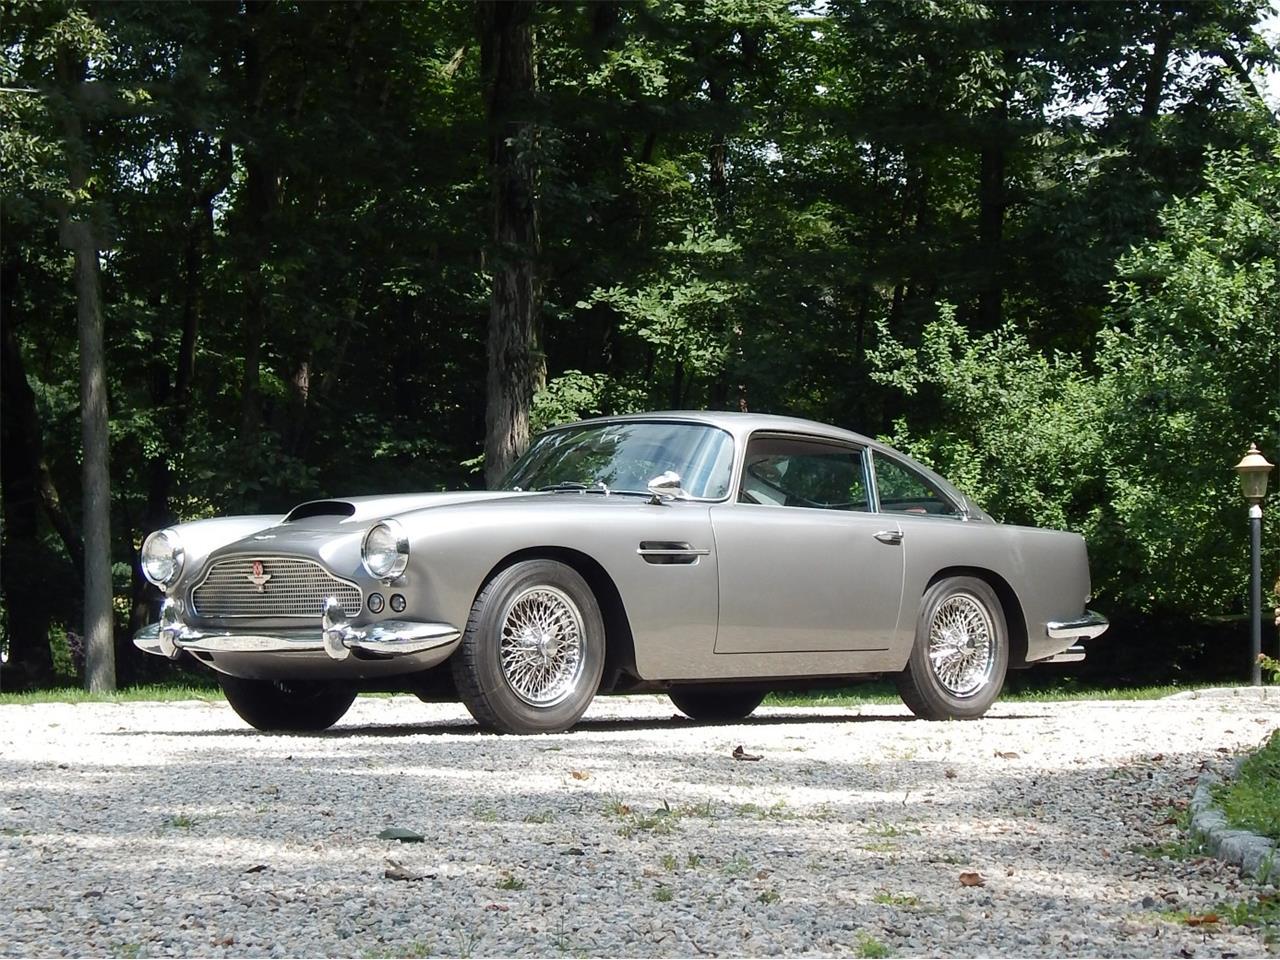 1961 Aston Martin Db4 Series Ii For Sale Classiccars Com Cc 1007383